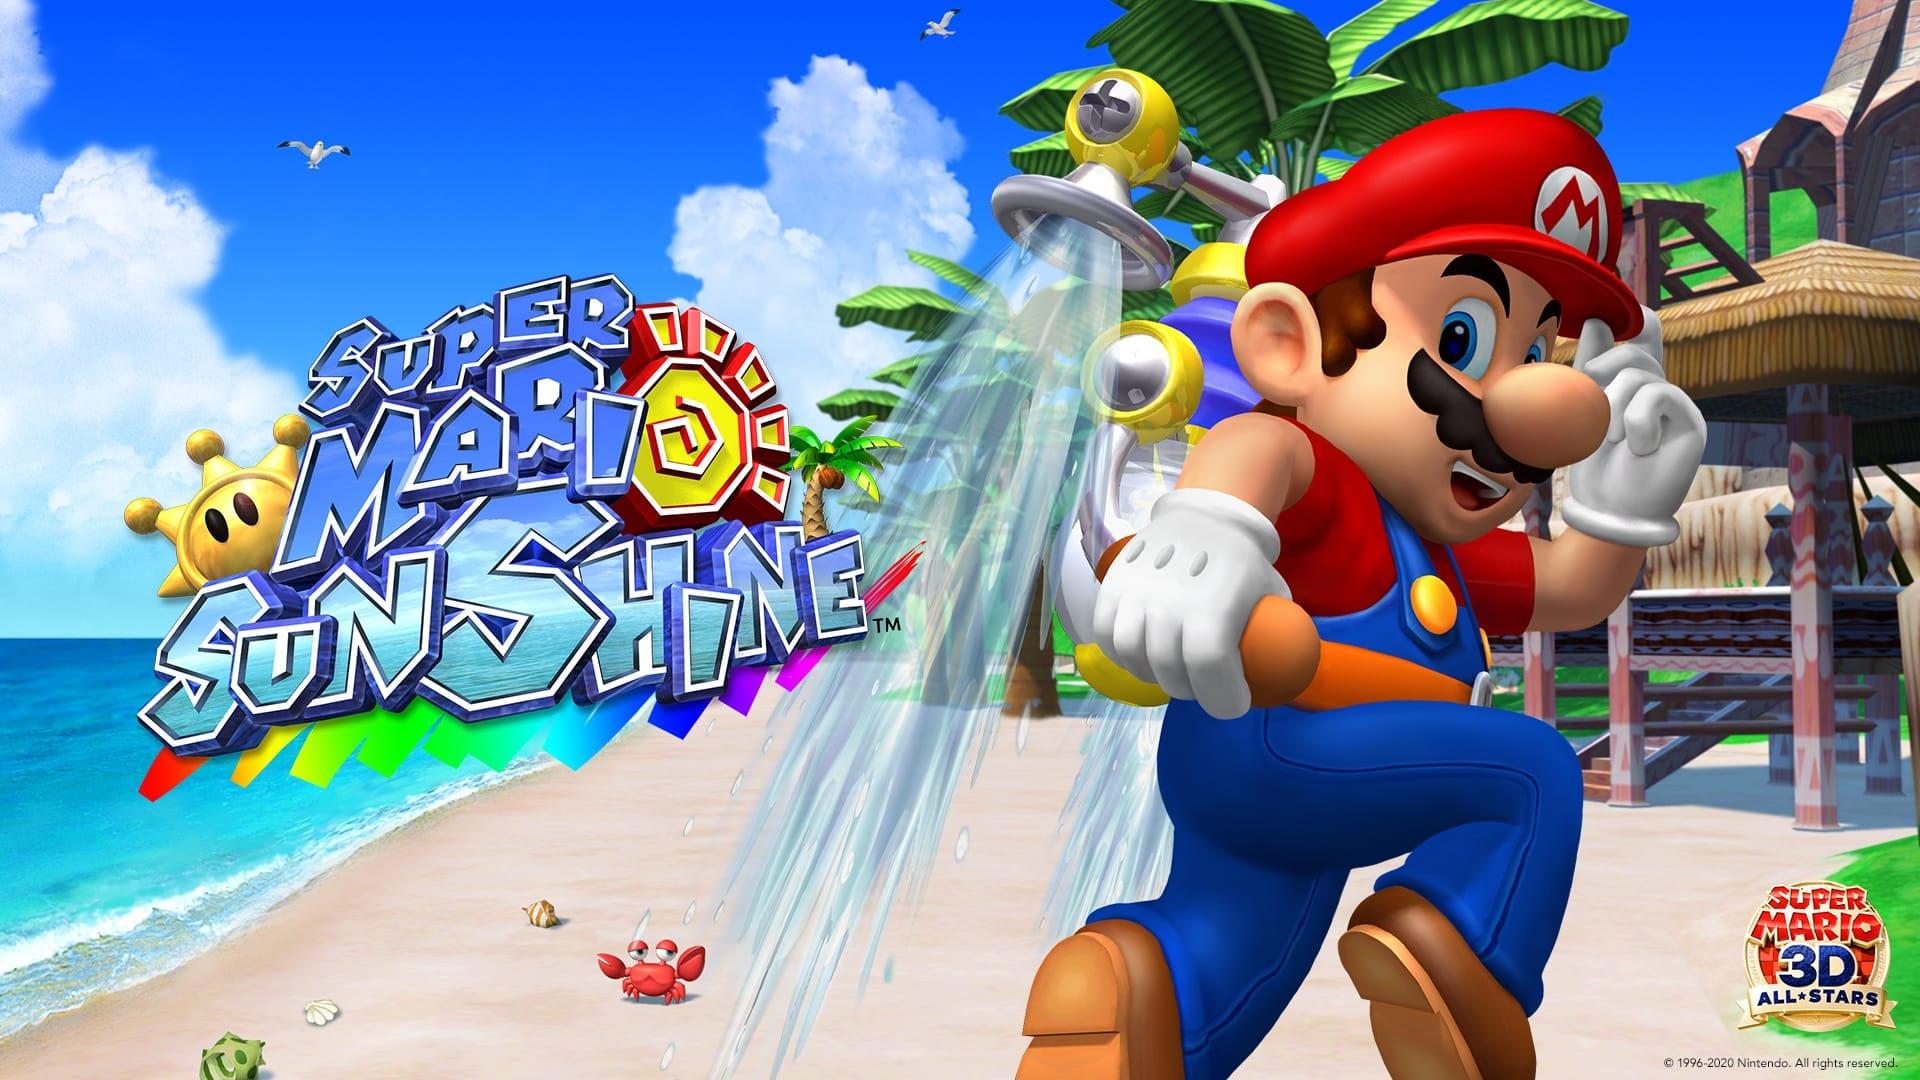 Super Mario Sunshine, How to Spray While Running